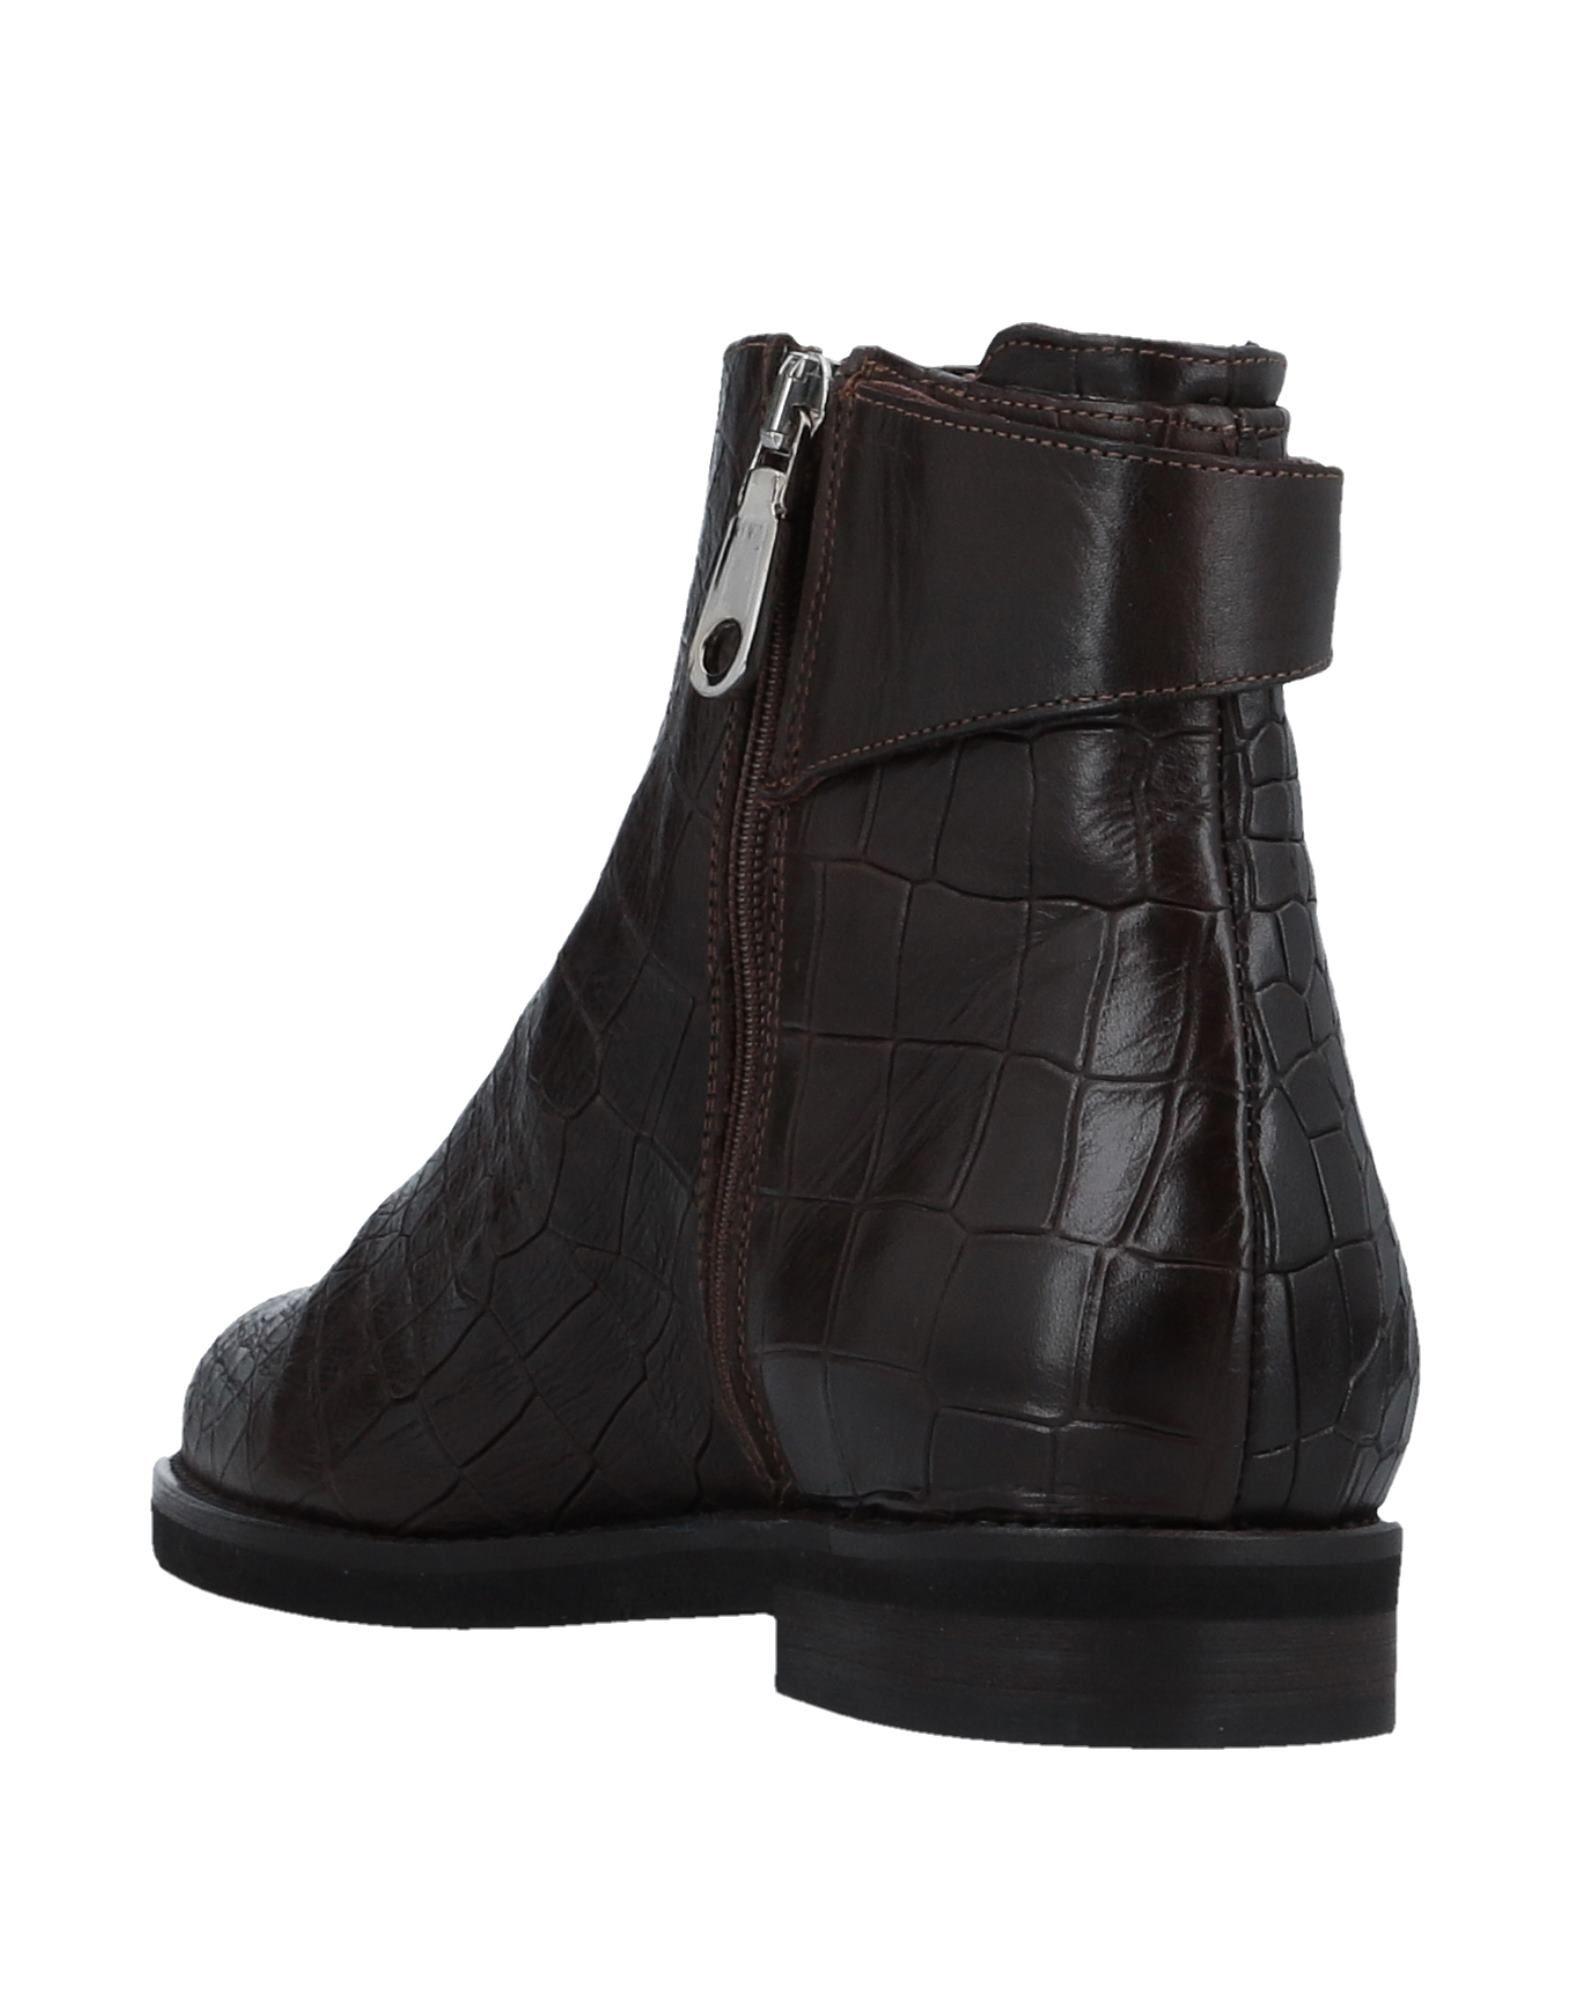 Sensunique Stiefelette 11509132VB Damen  11509132VB Stiefelette Gute Qualität beliebte Schuhe ccbb6f